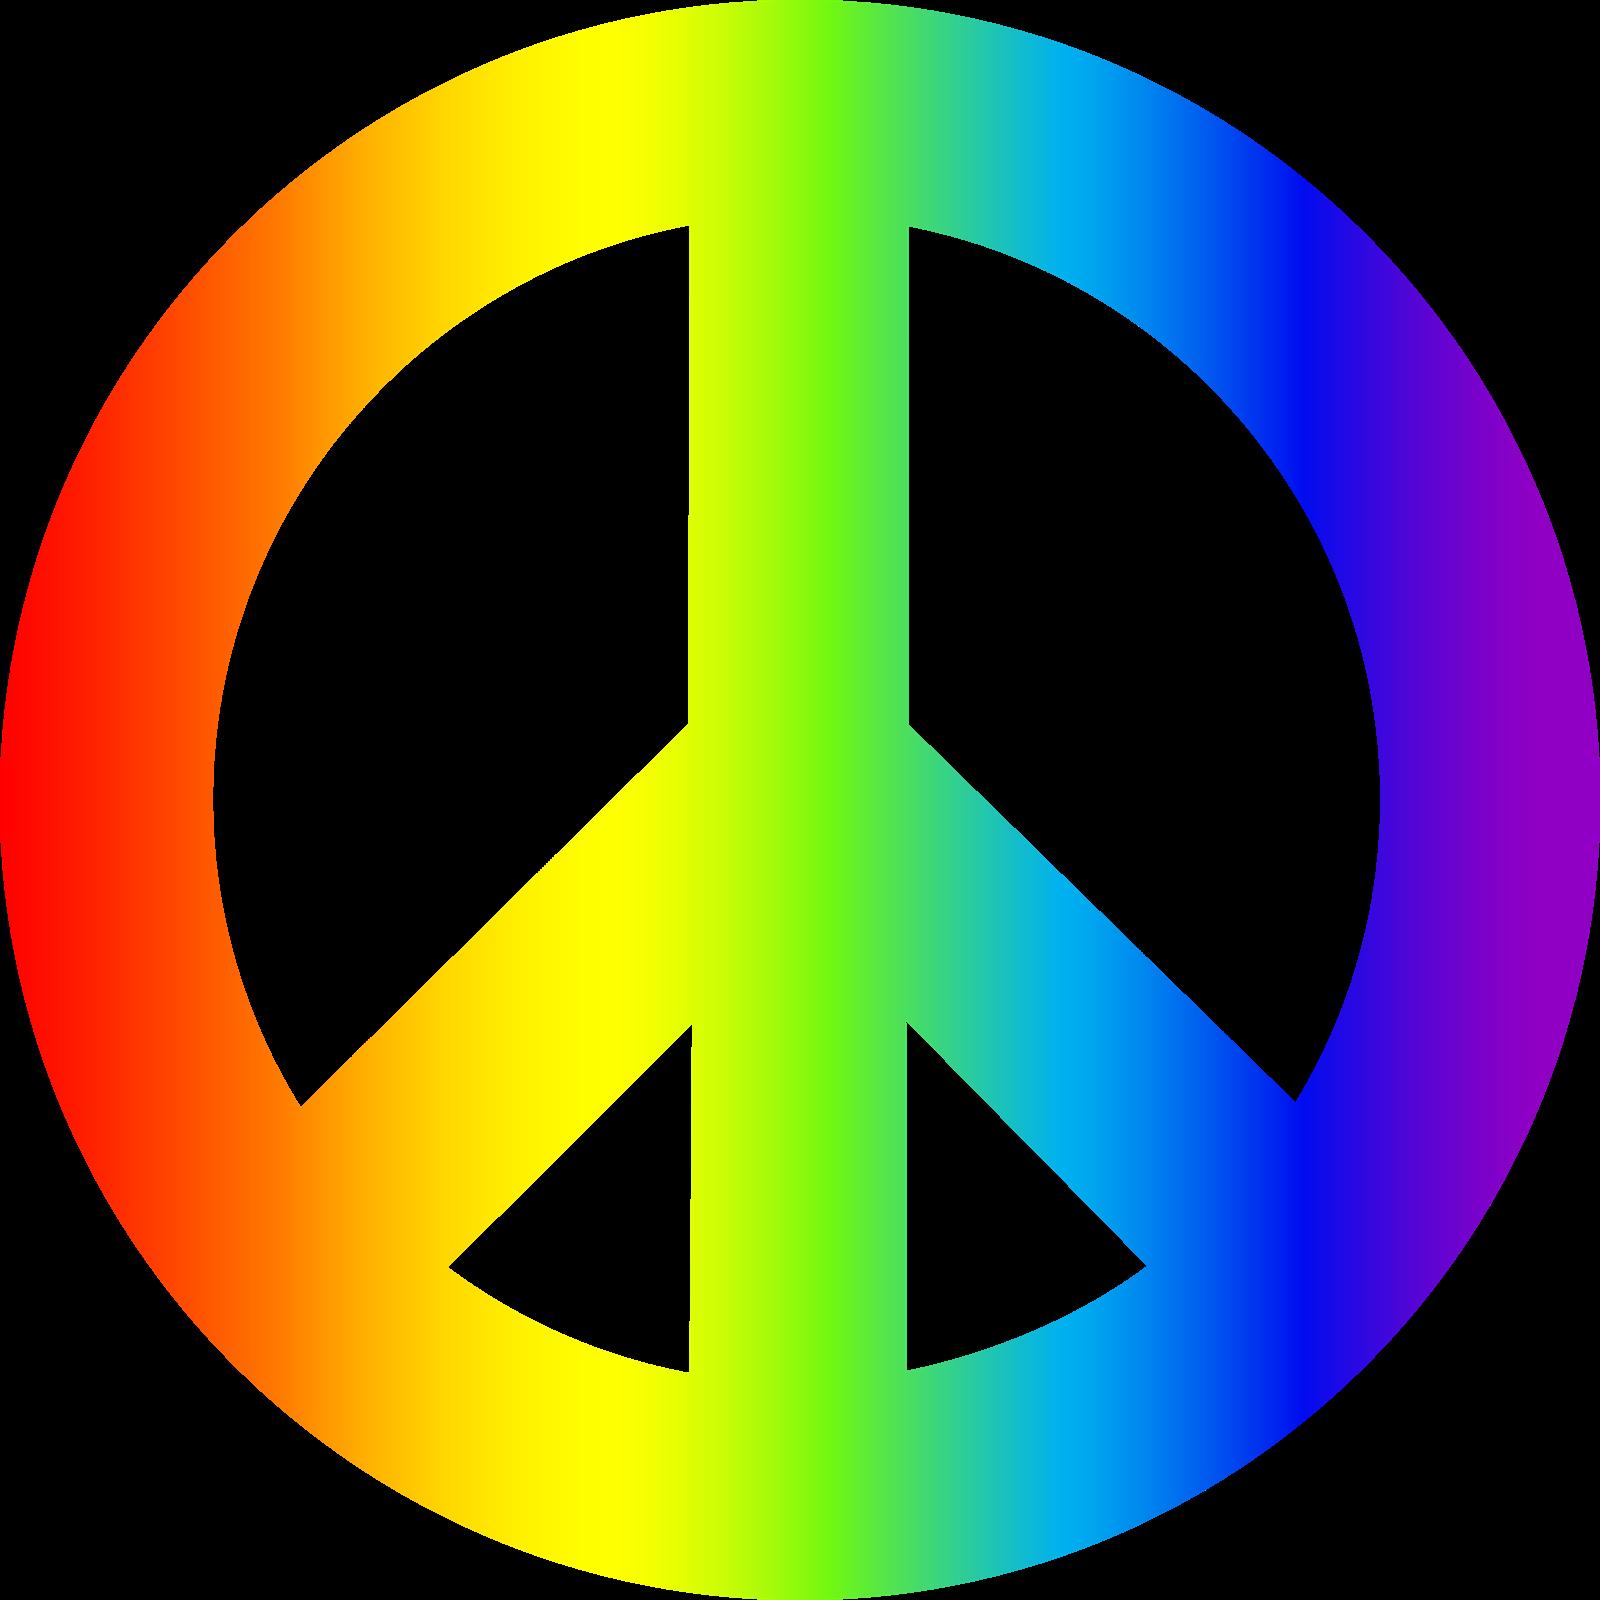 Gambar Logo Stempel Perusahaan